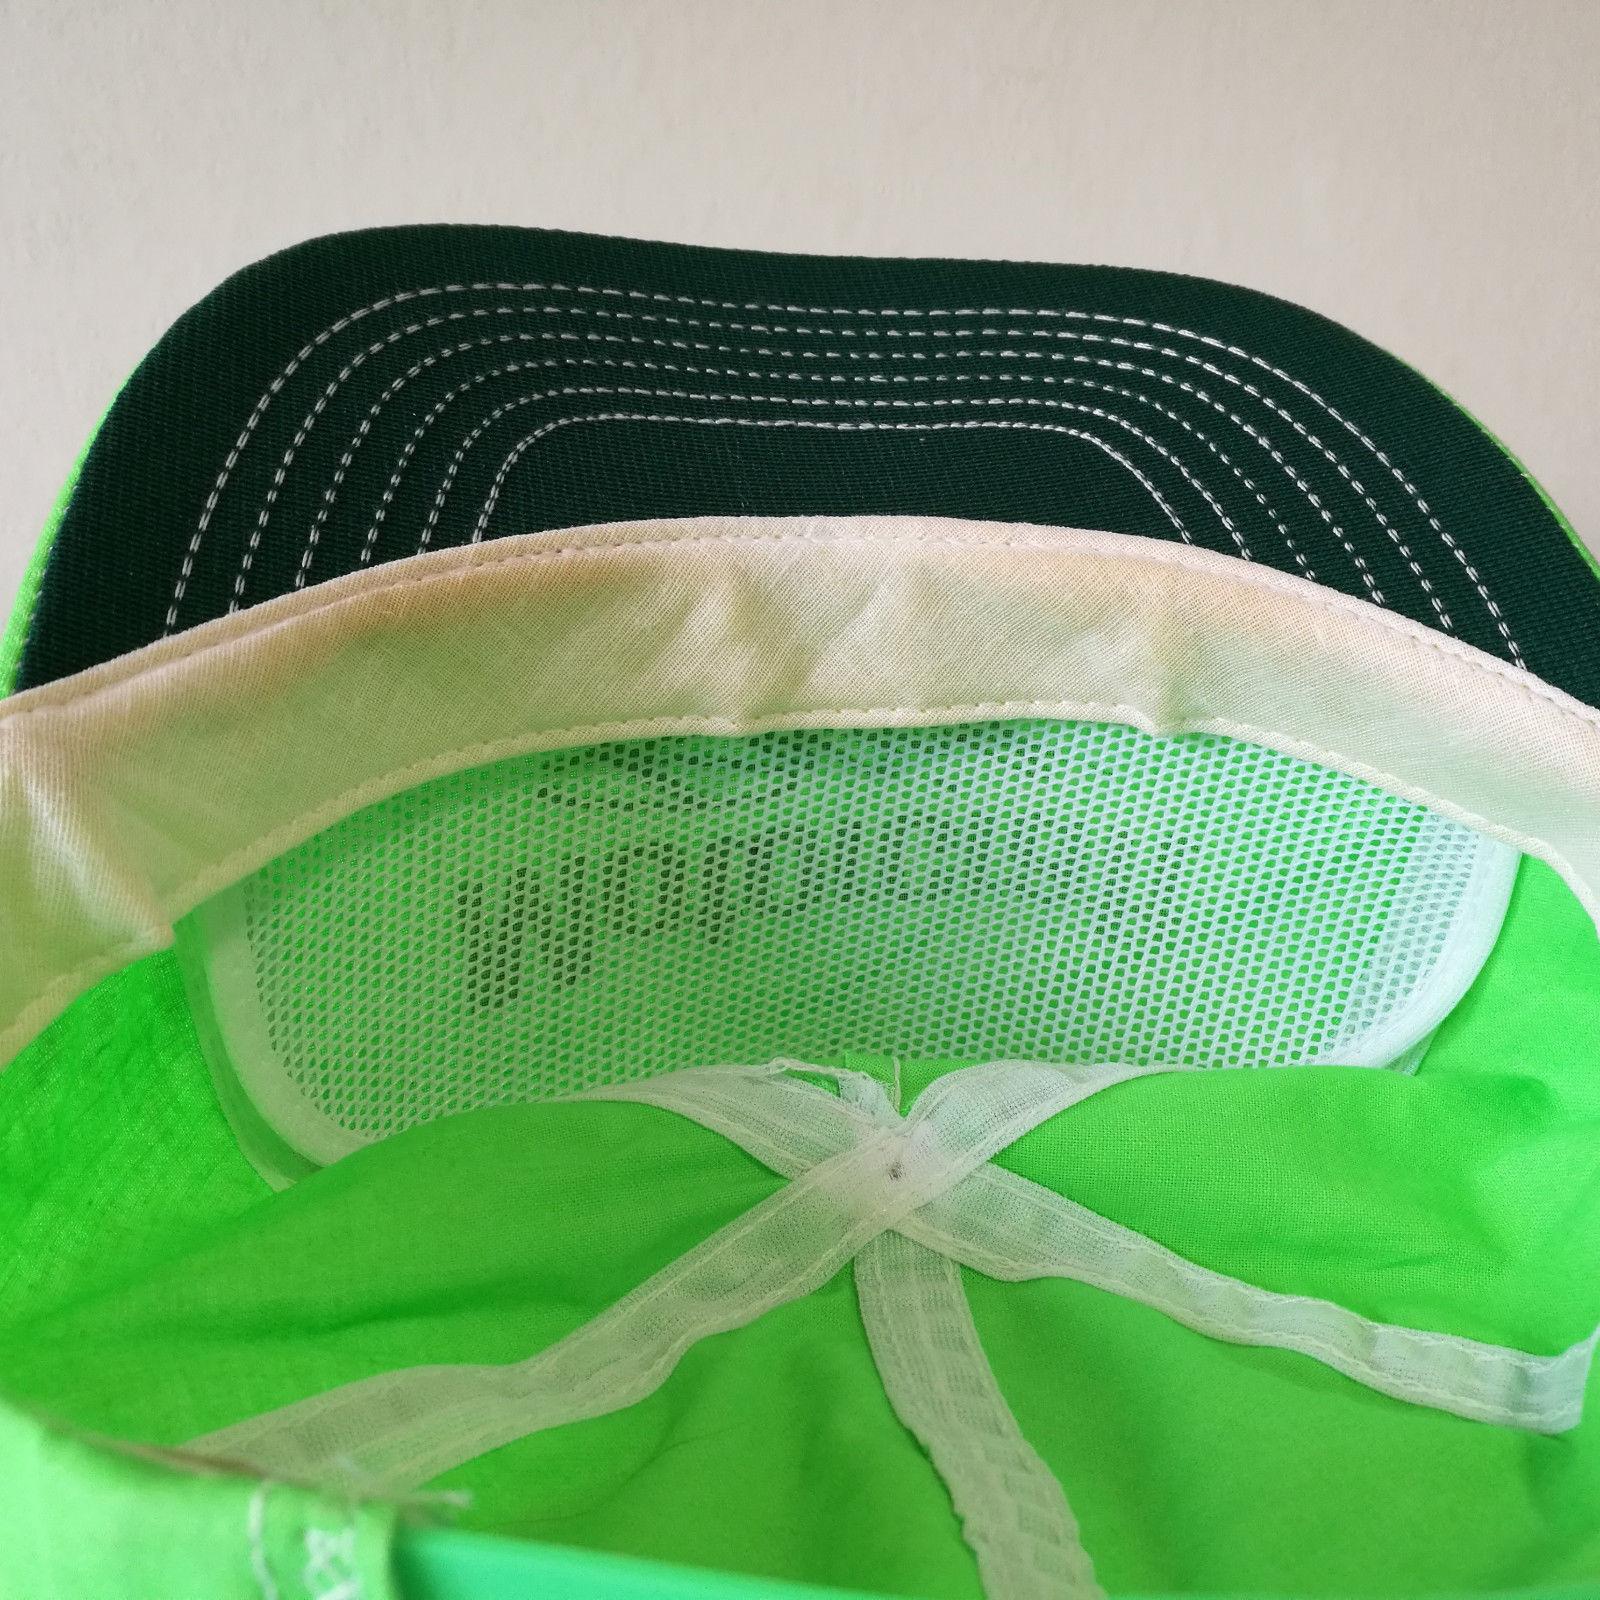 Vintage Motorcraft Racing Snapback Neon Green Hat Made in USA